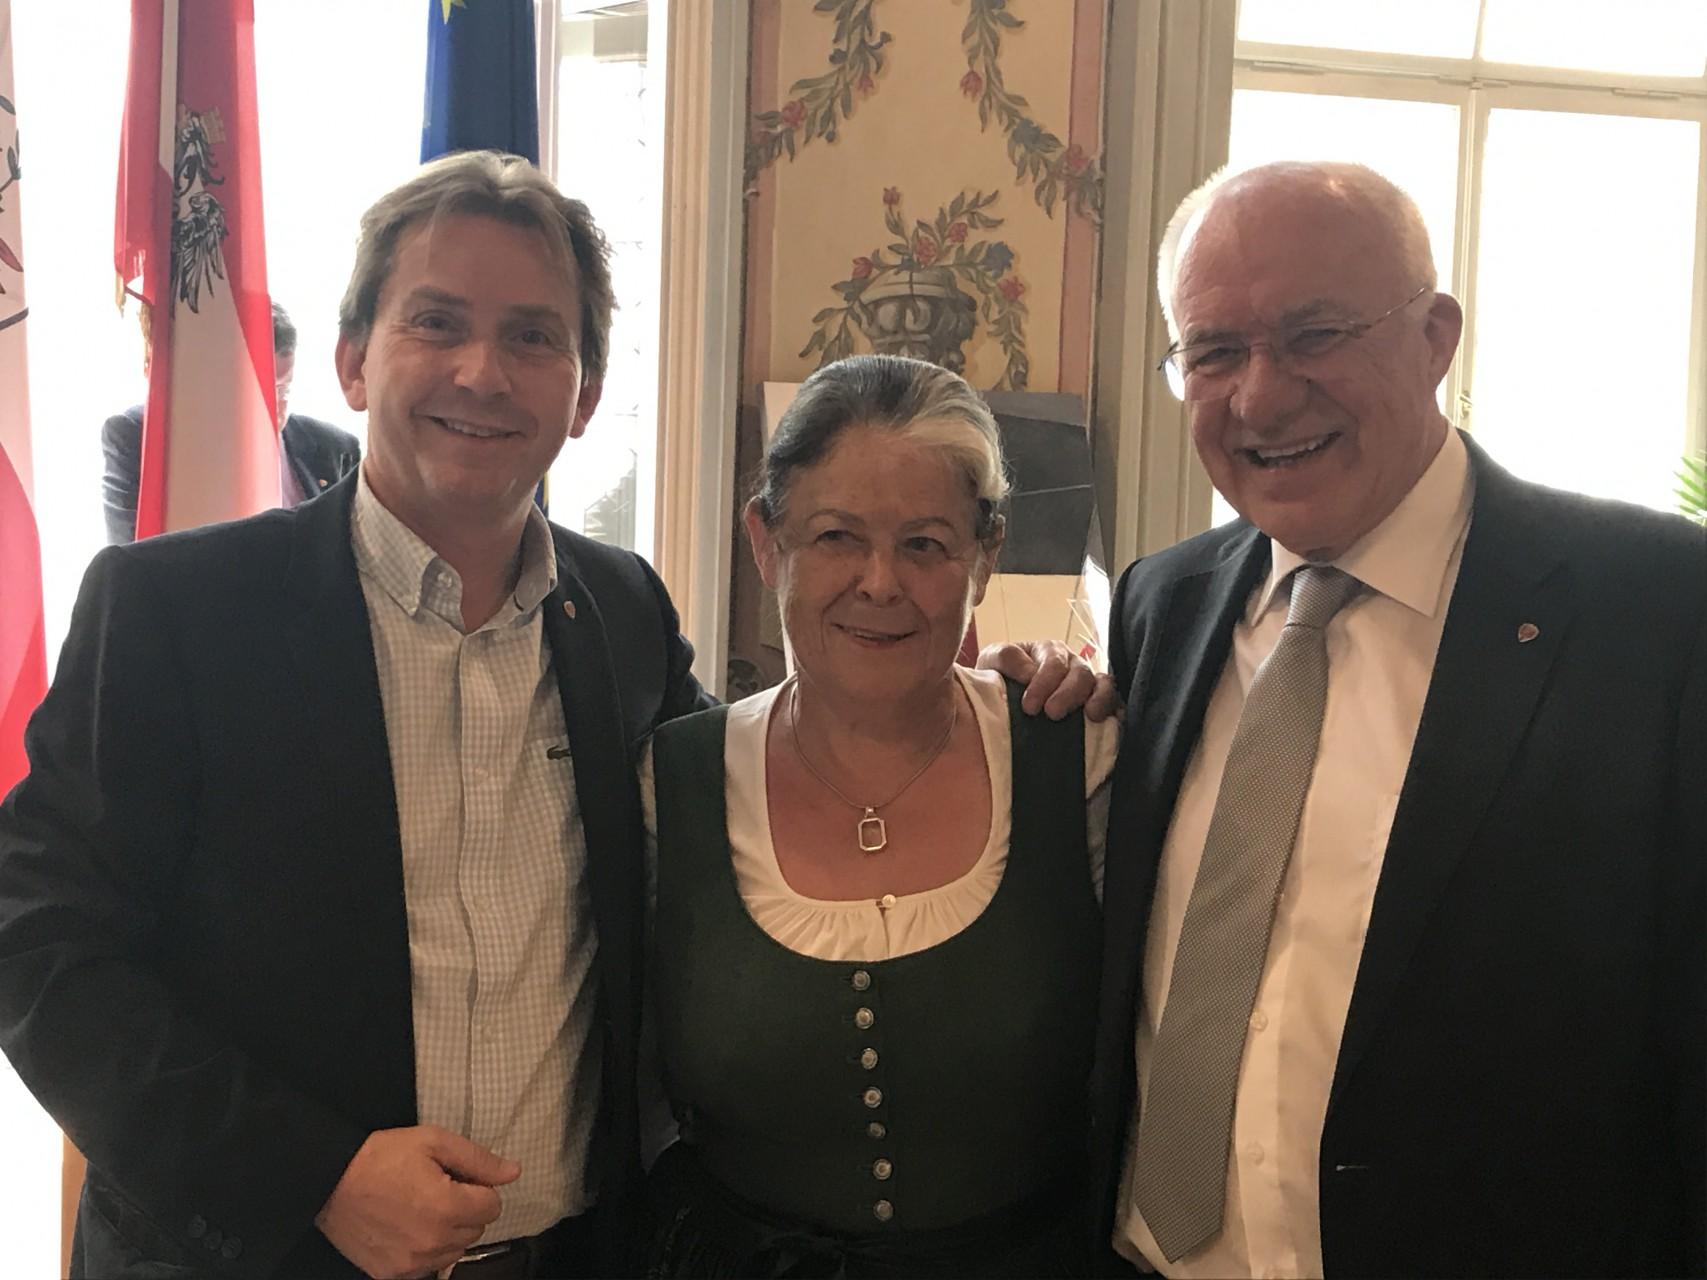 Geburtstag mit LT Präsident Herwig van Staa